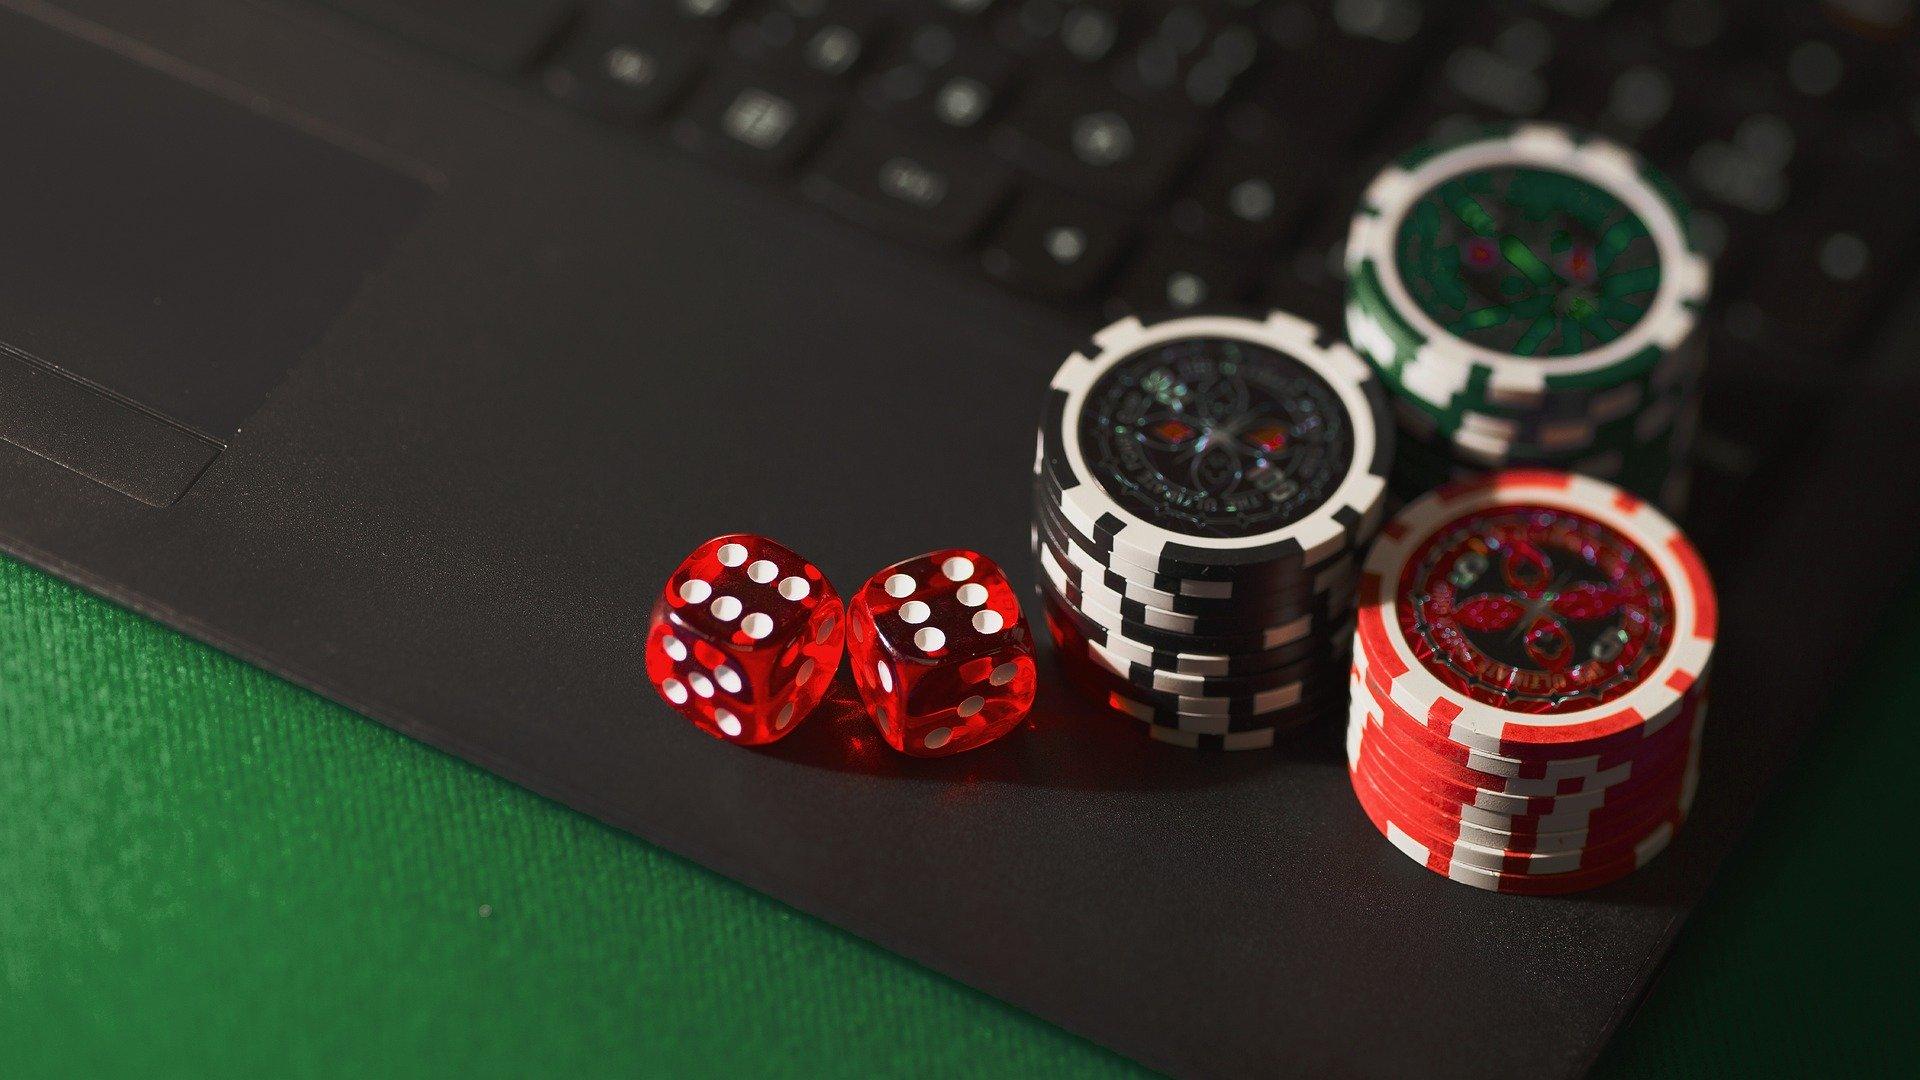 Choosing Online Casinos - How To Choose The Best Online Casino In New Zealand